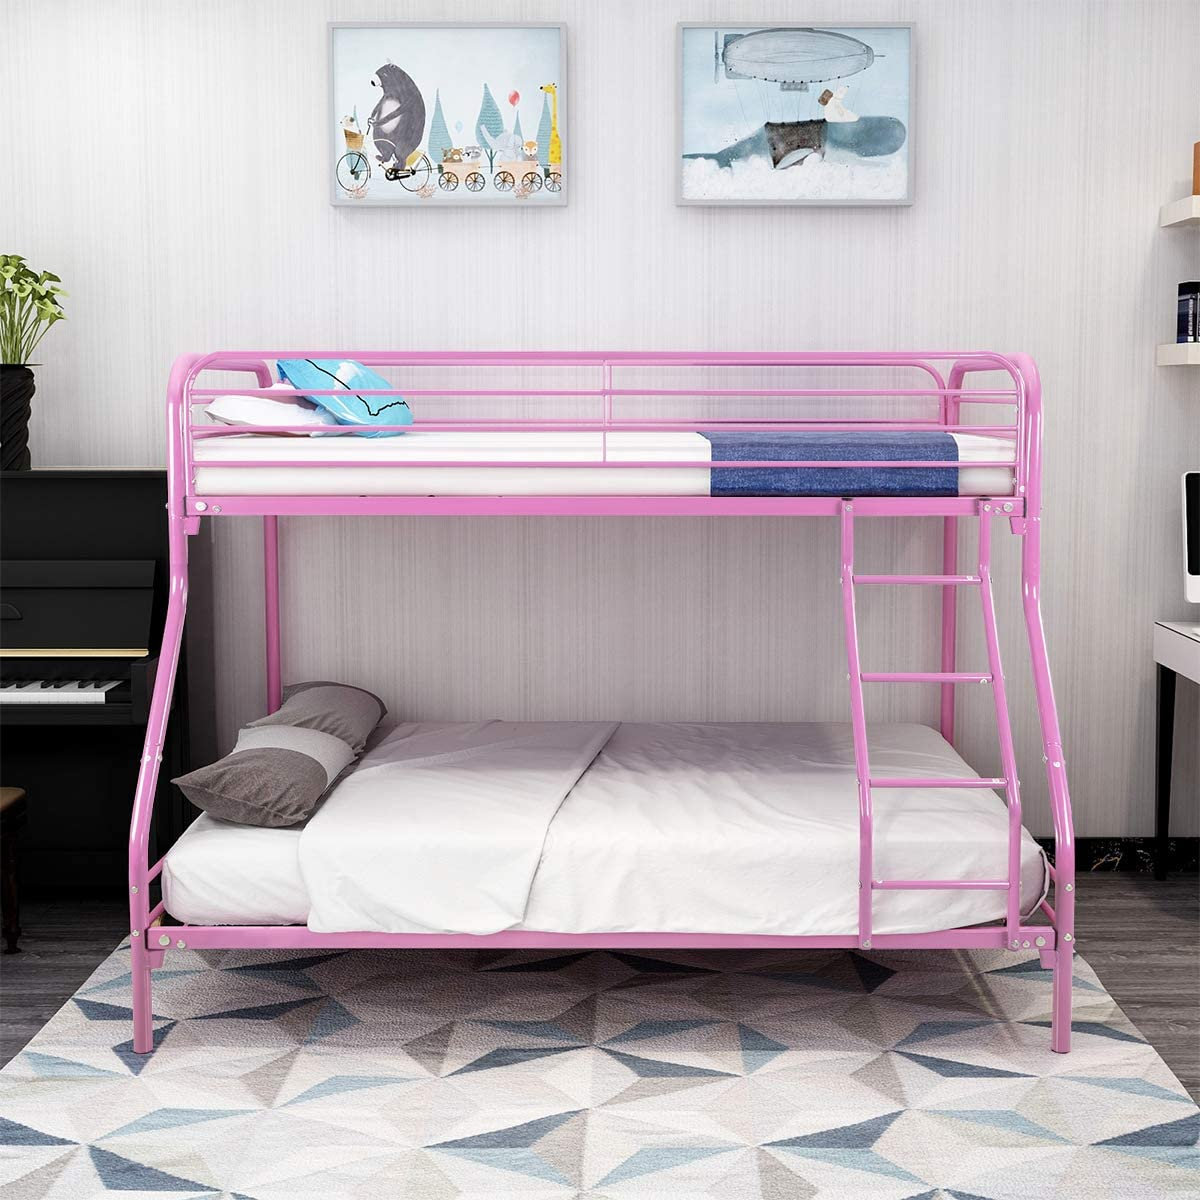 Metal Twin Over Full Bunk Bed Heavy Duty Steel Slabs Platform With Ladder Sturdy Frame Foundation Blue Color Furniture Home Urbytus Com